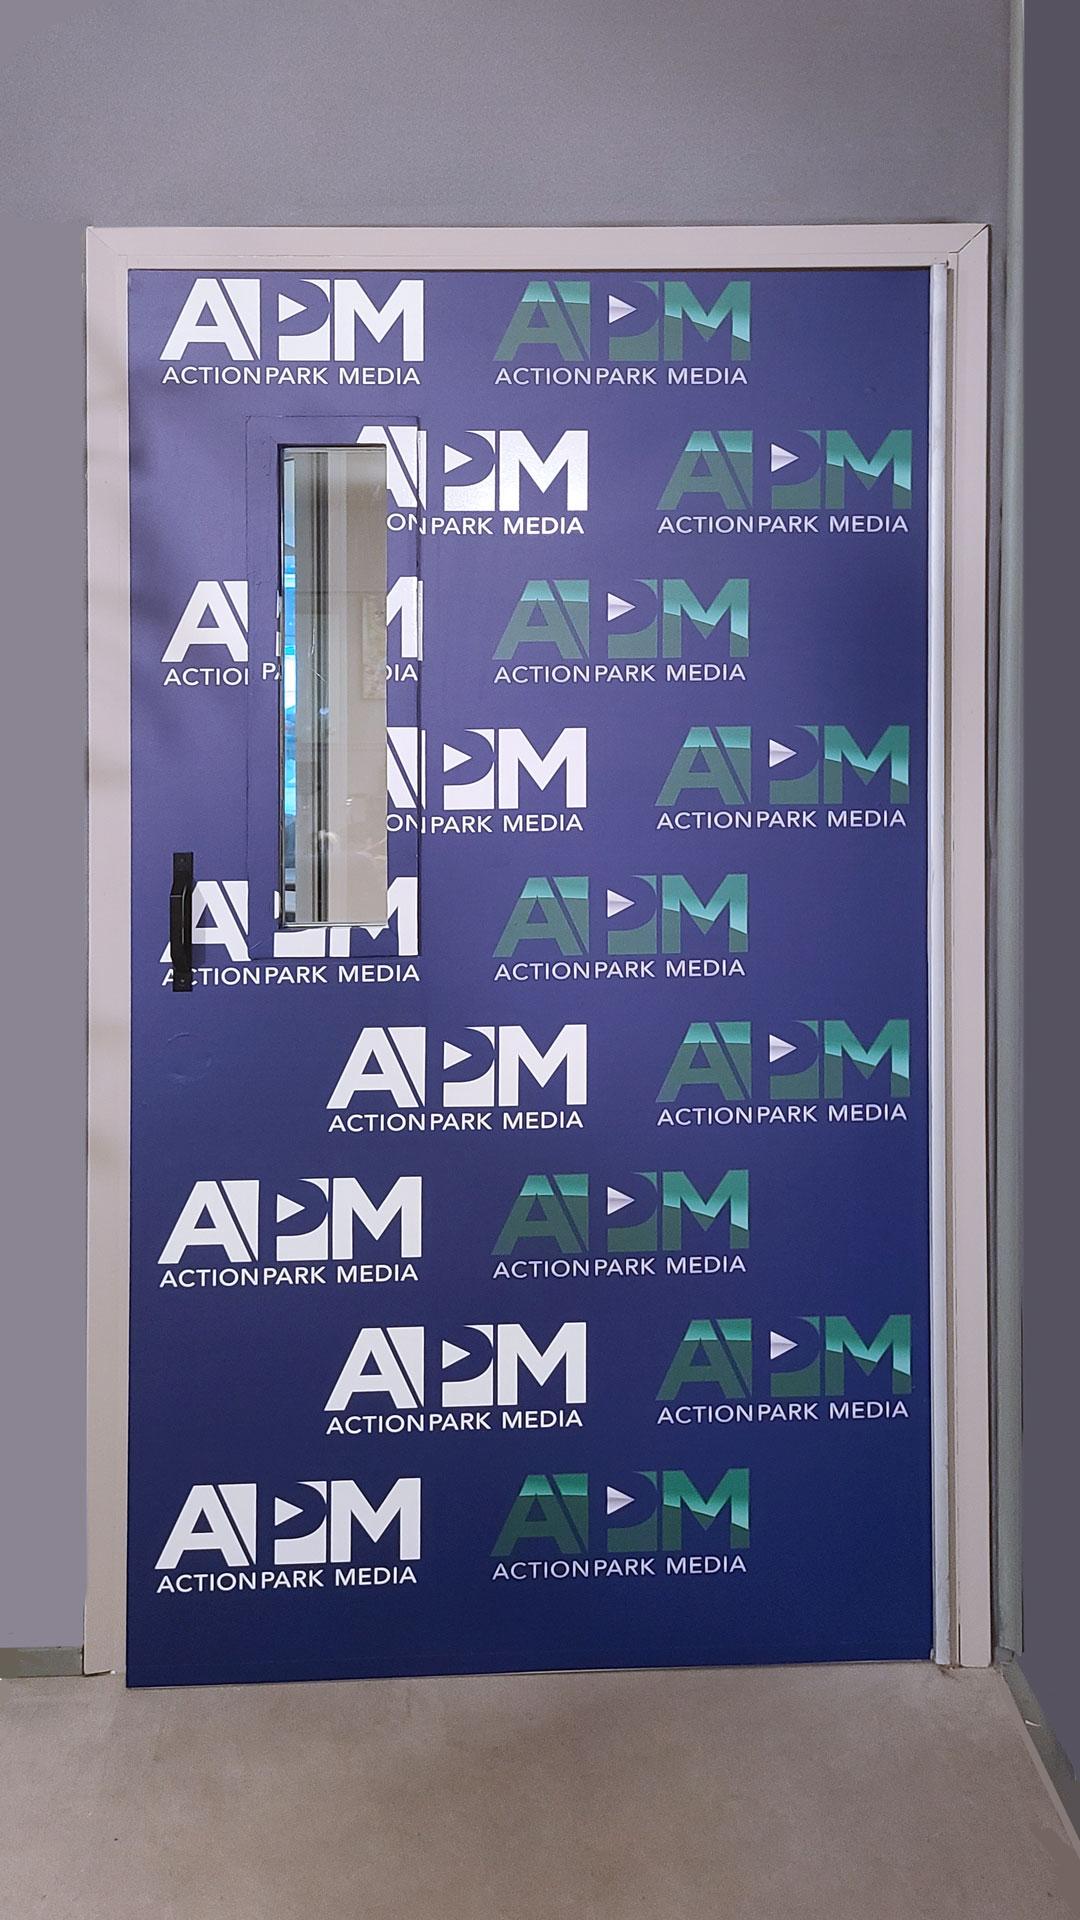 APM custom decal